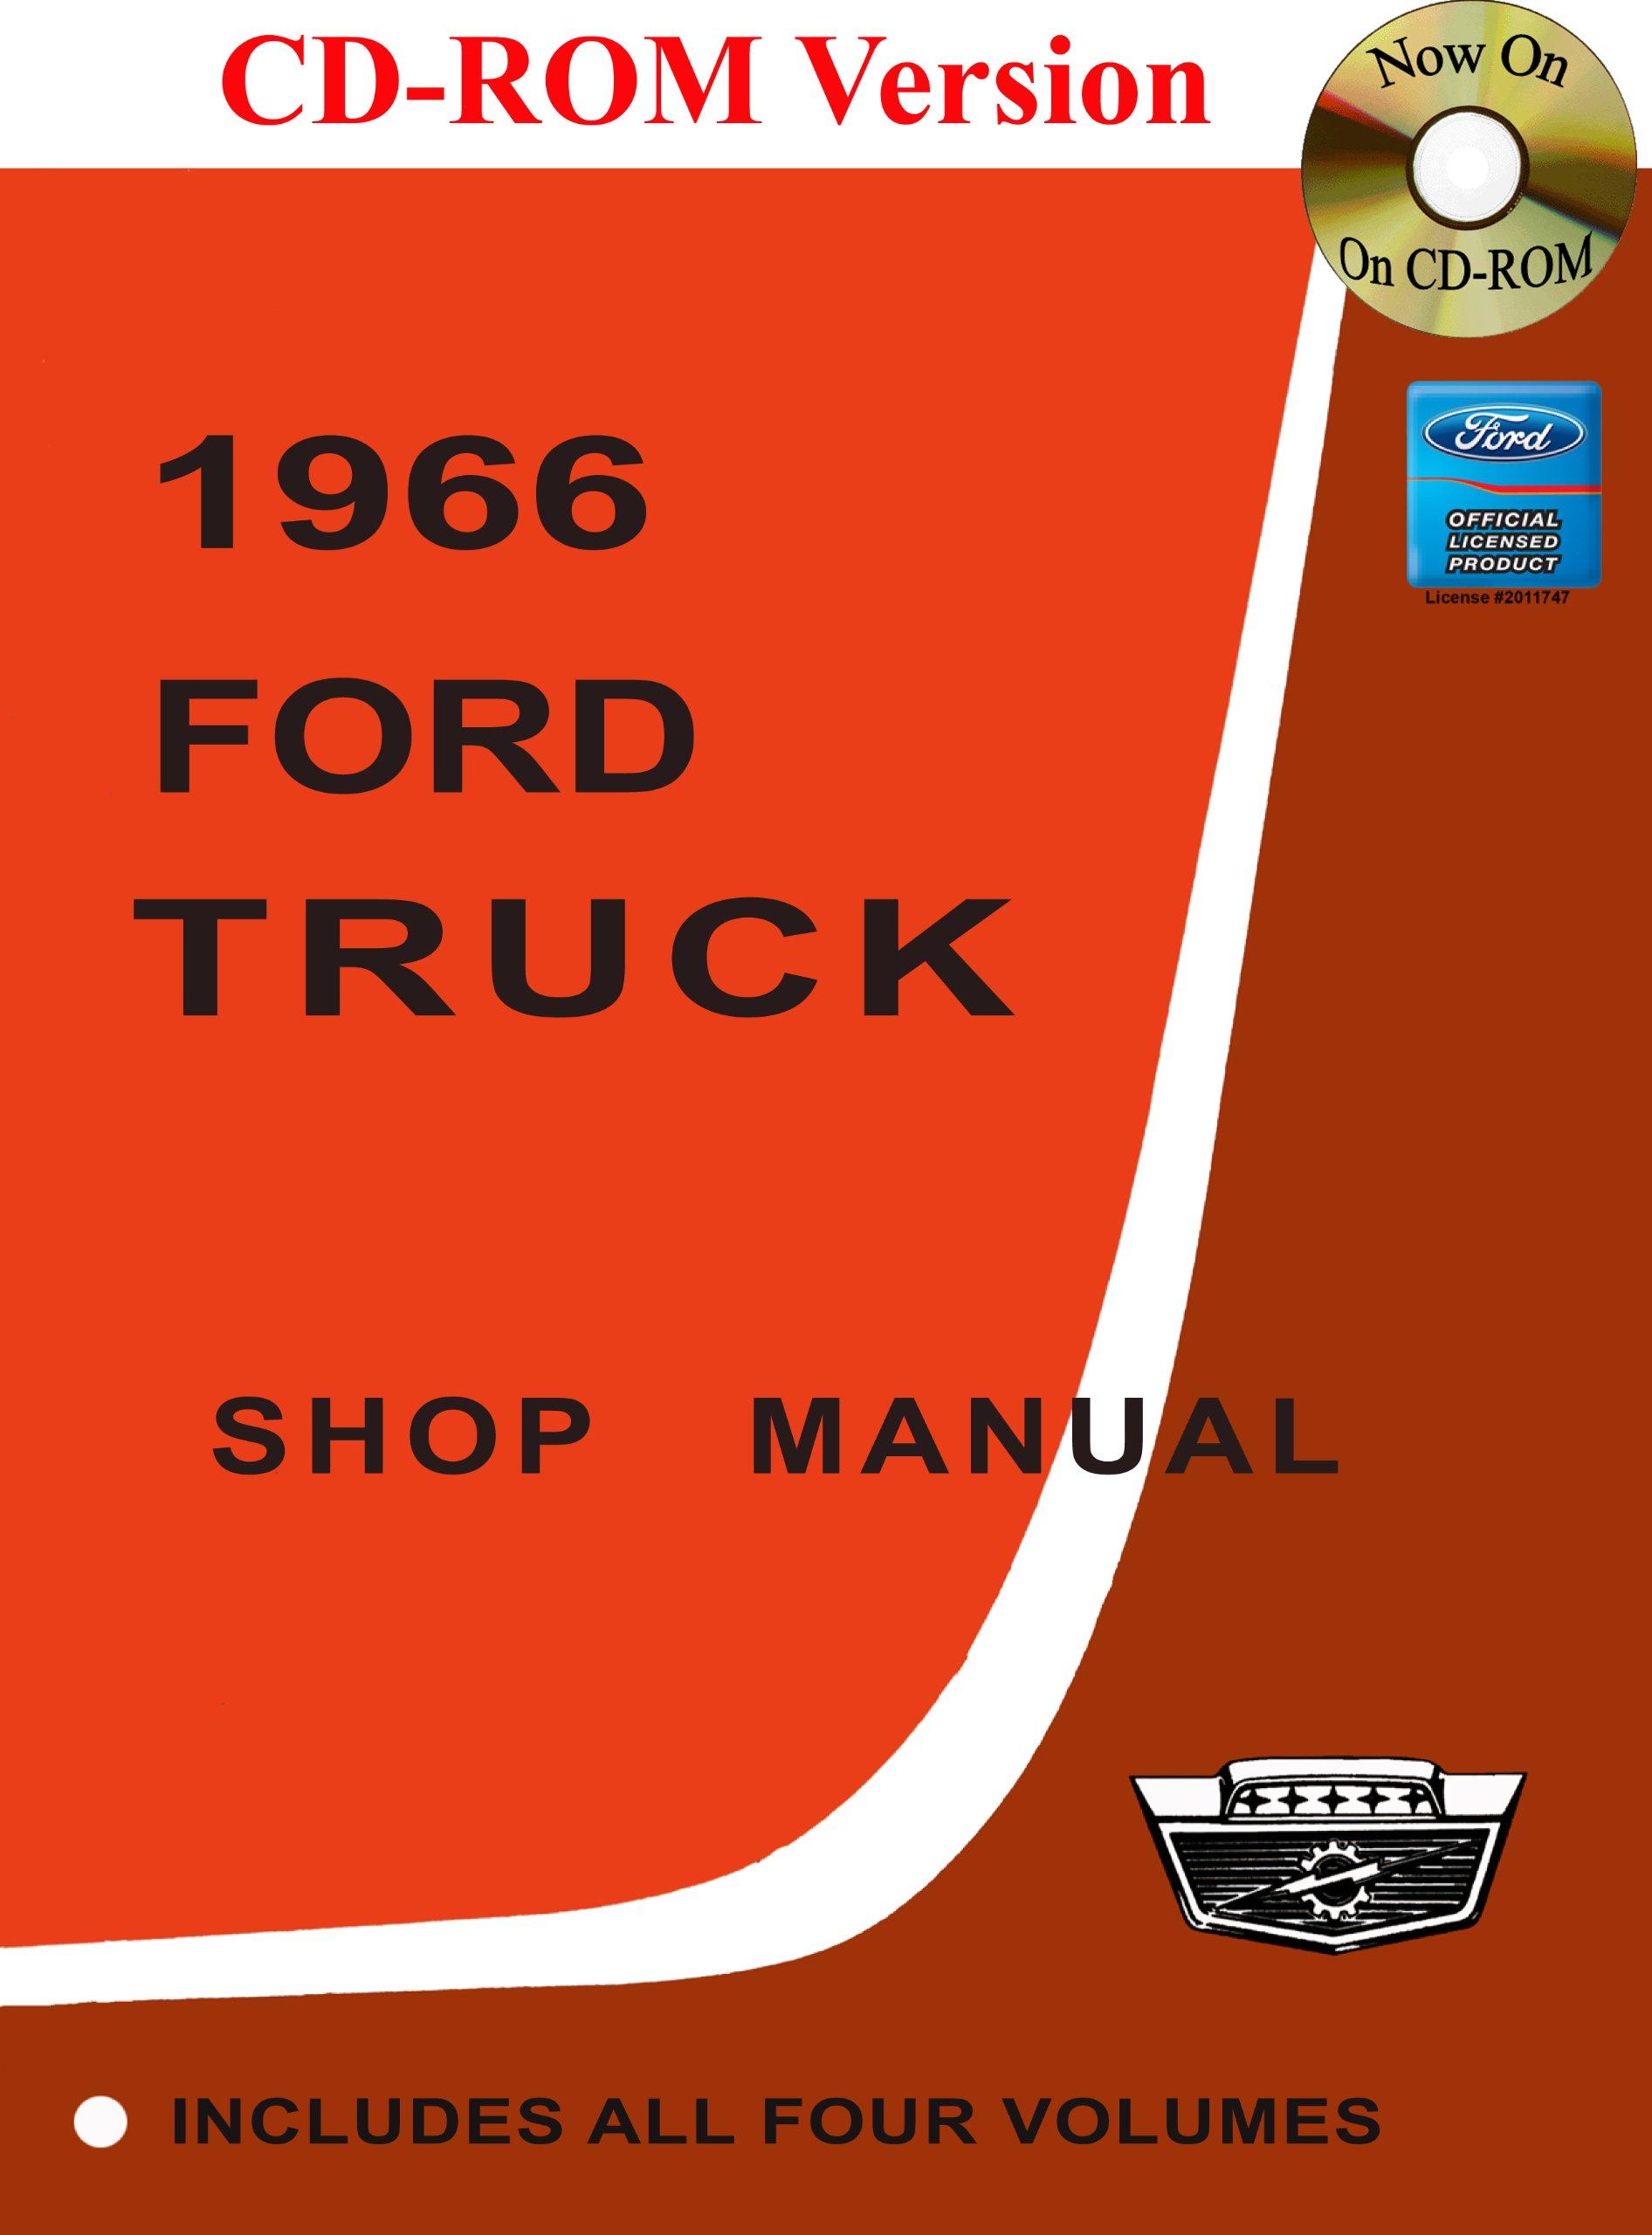 1966 ford truck shop manual ford motor company david e leblanc rh amazon com 1966 ford galaxie shop manual 1966 ford mustang shop manual free download